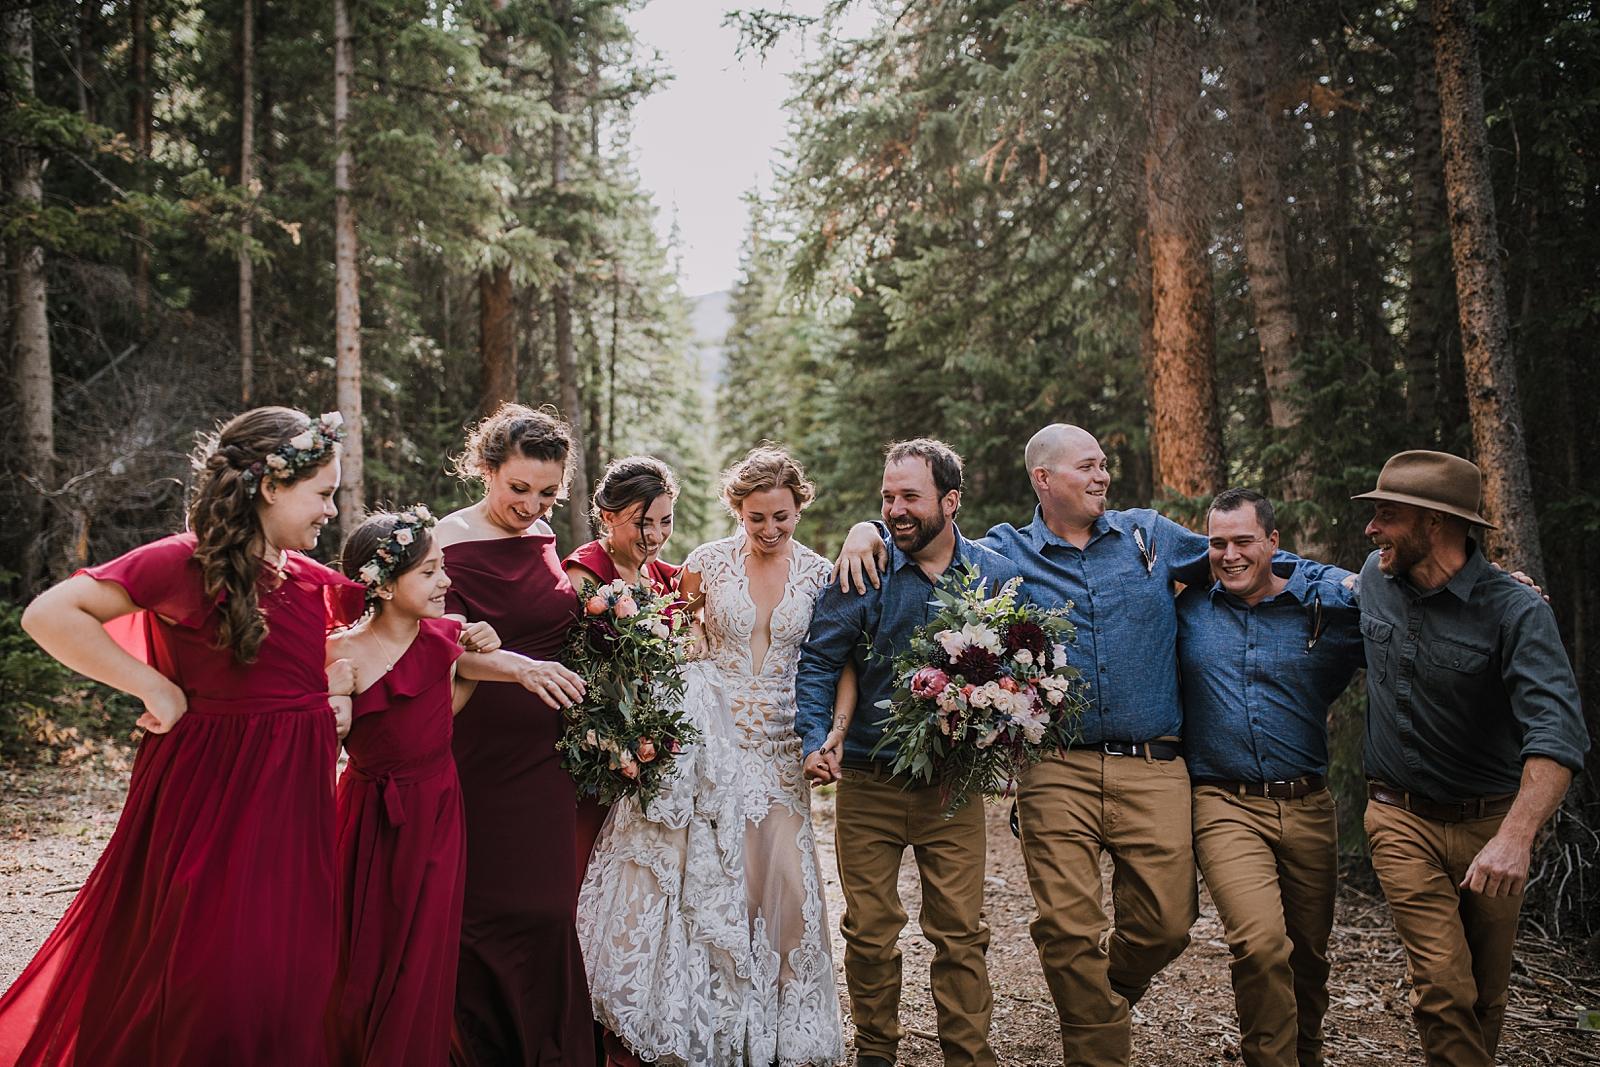 groom holding veil, hiking the cucumber gulch trail in breckenridge colorado, breckenridge nordic center summer wedding, summer wedding in breckenridge colorado, hiking the breckenridge nordic trails